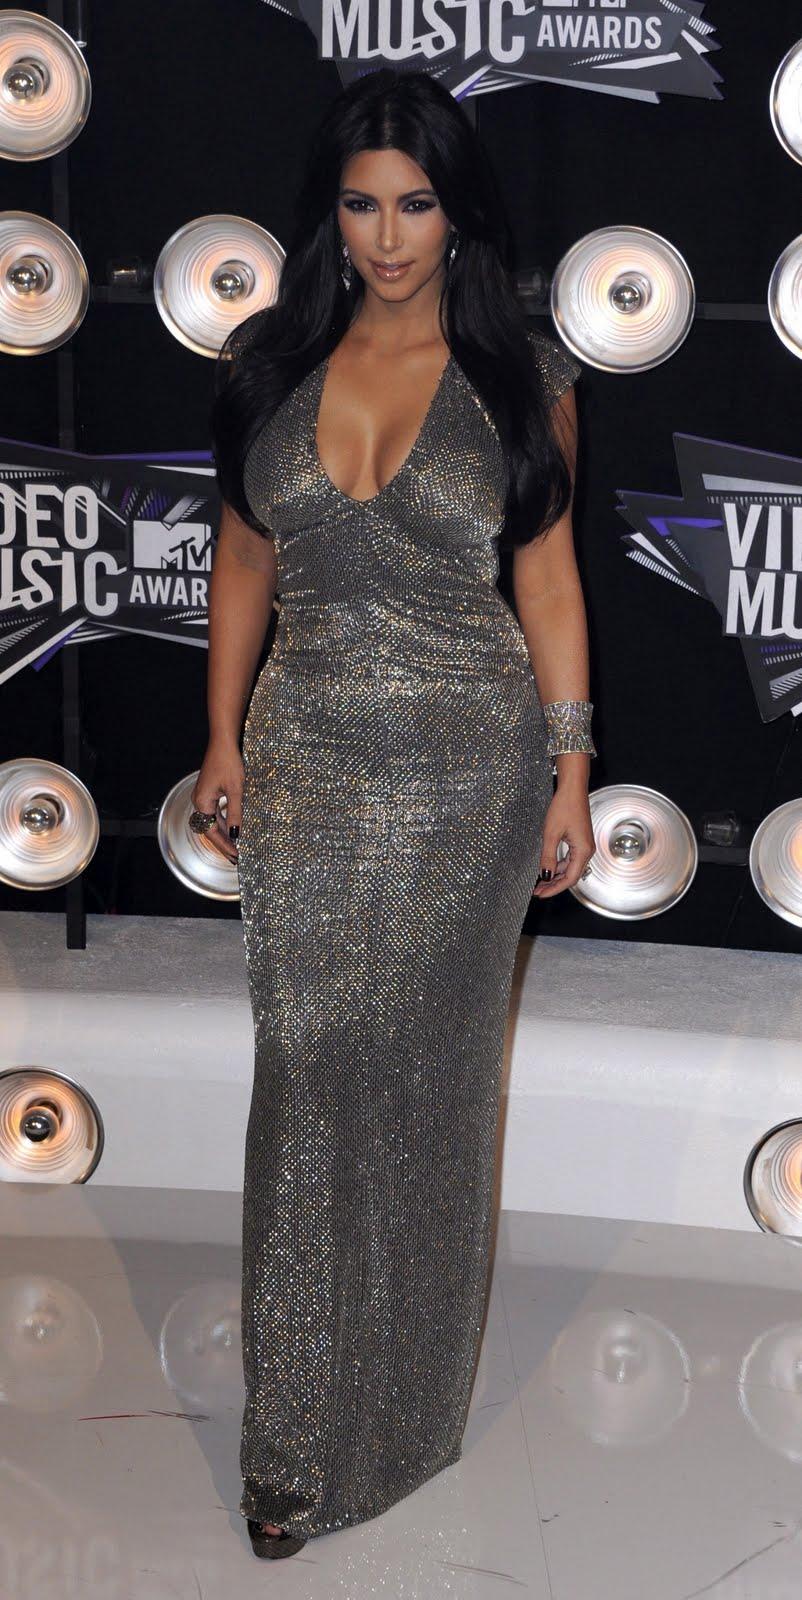 http://4.bp.blogspot.com/-bRSqDaCKzXI/TqP3LSVBdNI/AAAAAAAAFRs/ULyCOi9lFBs/s1600/Kim-Kardashian-104.jpg